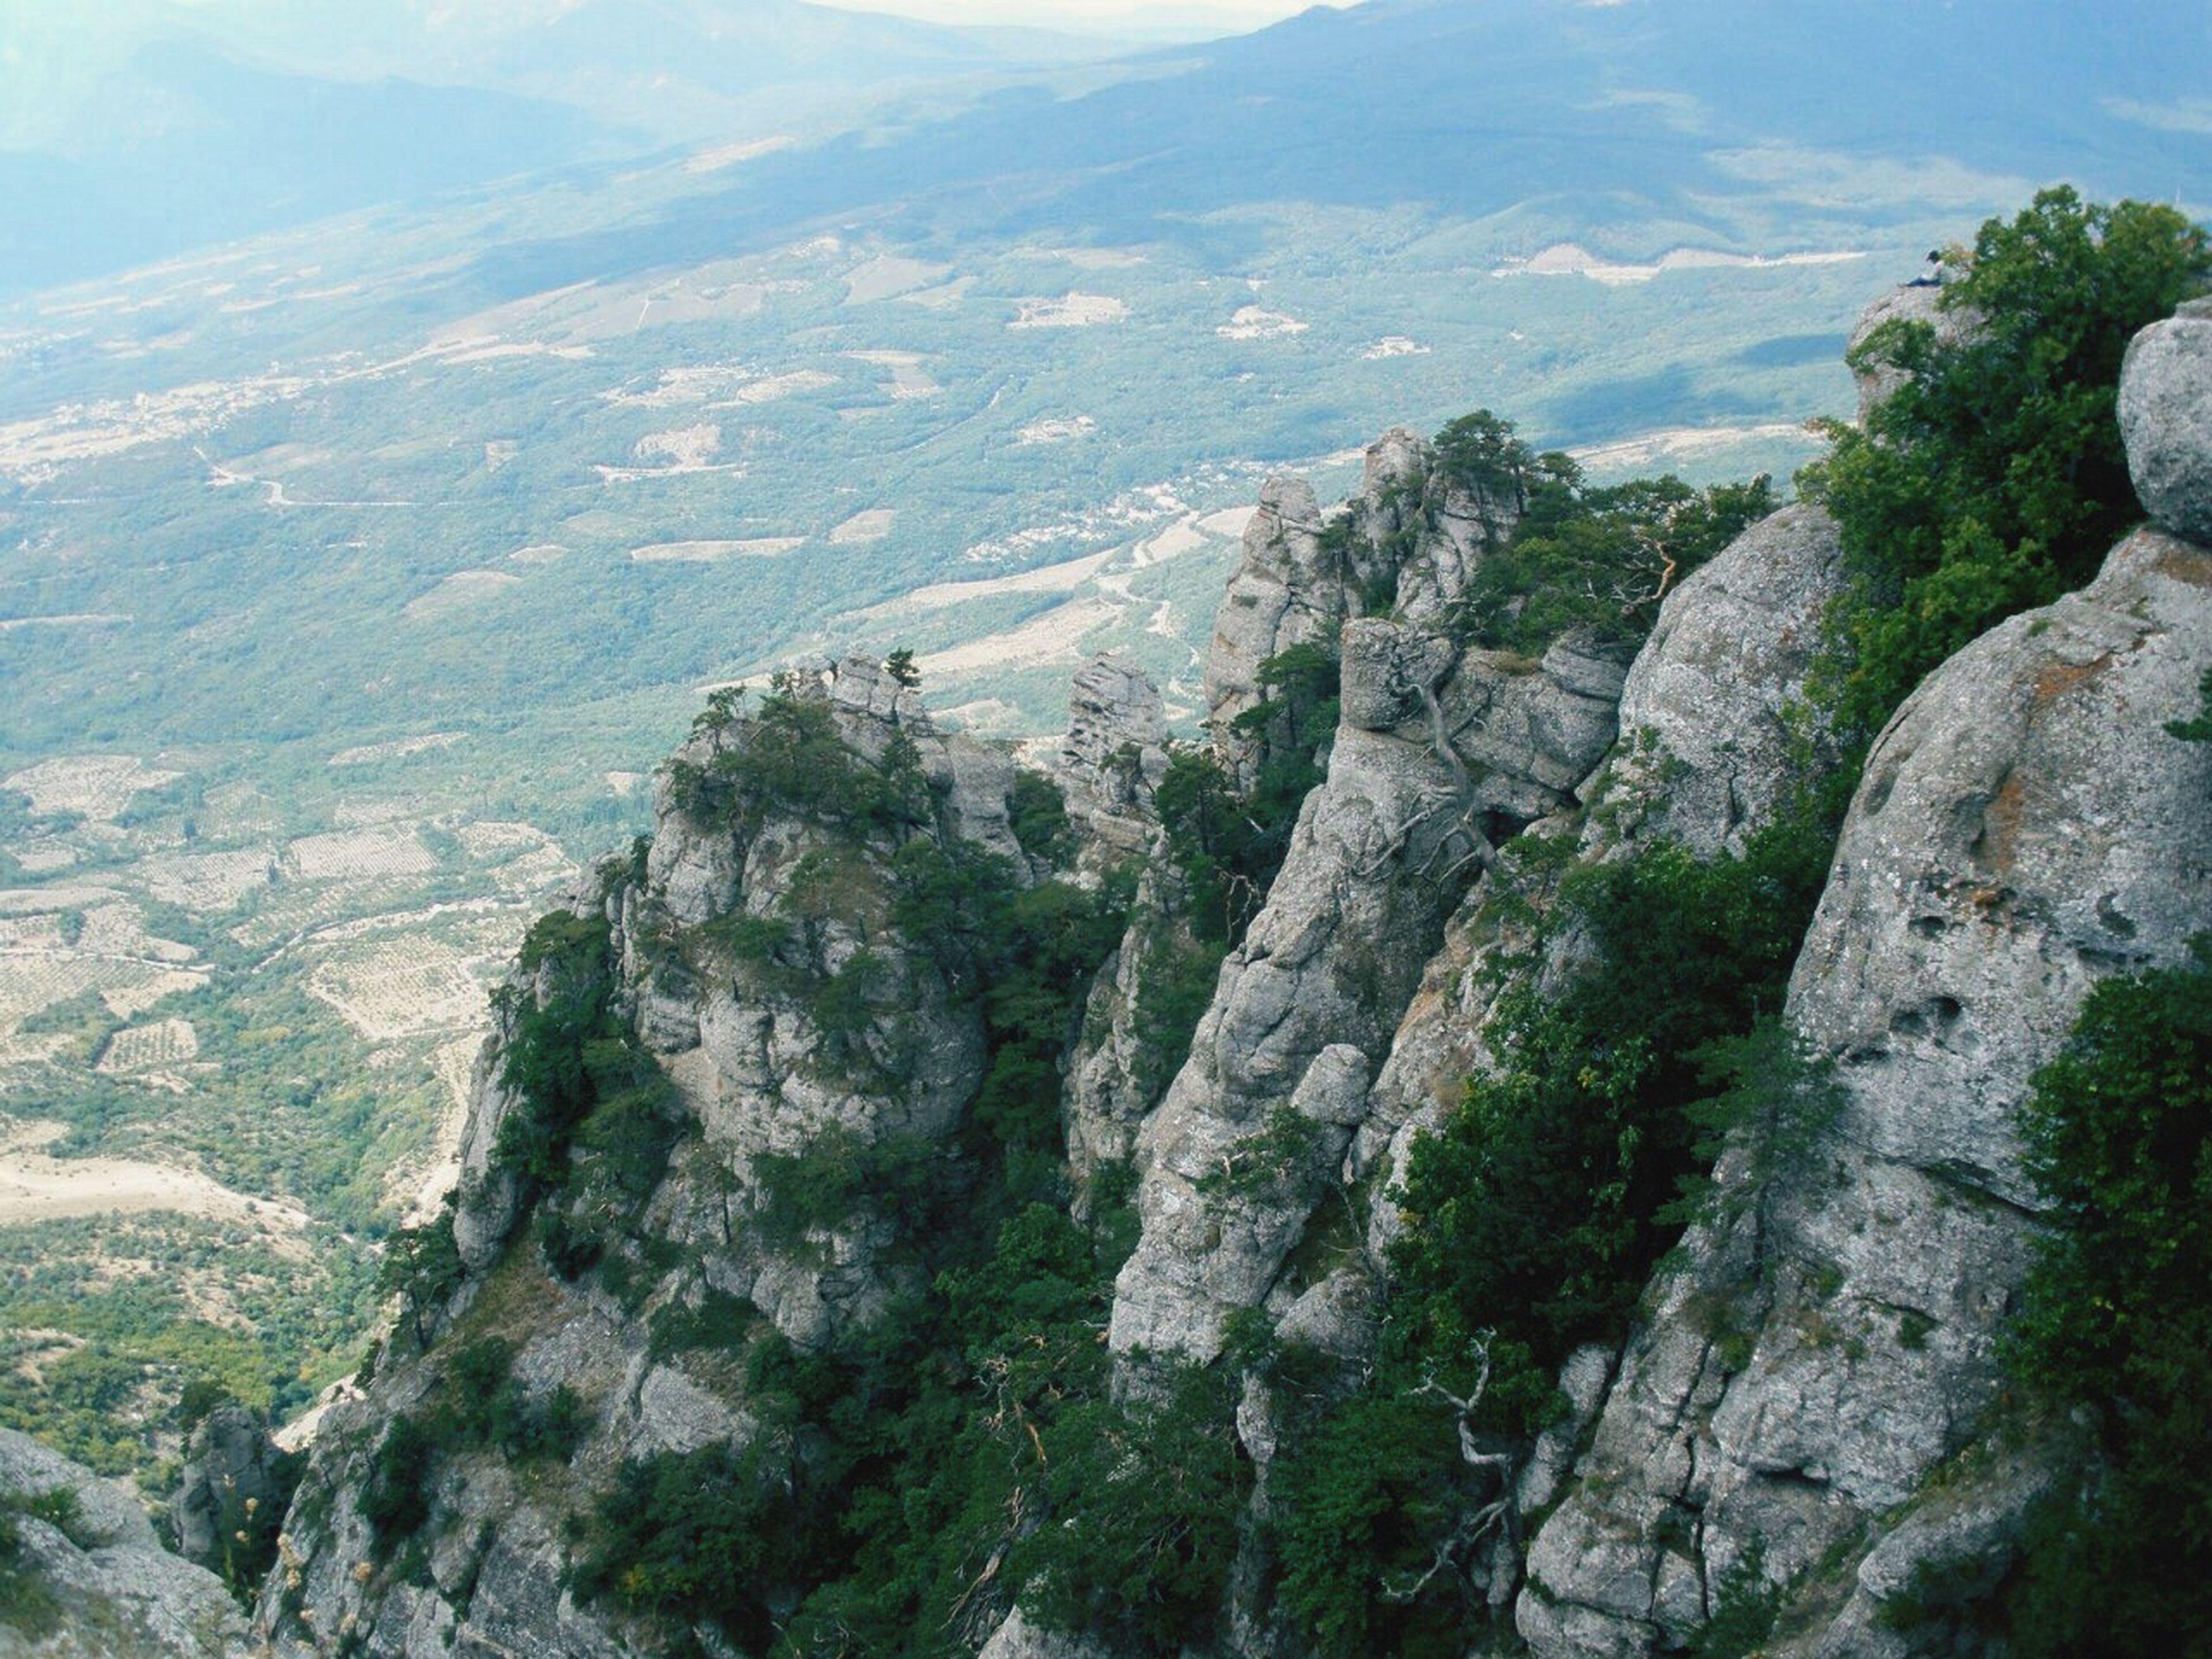 Miles Away Krimea Ukraine Beauty In Nature Landscape Mountain Nature Mountain Ridge Sky